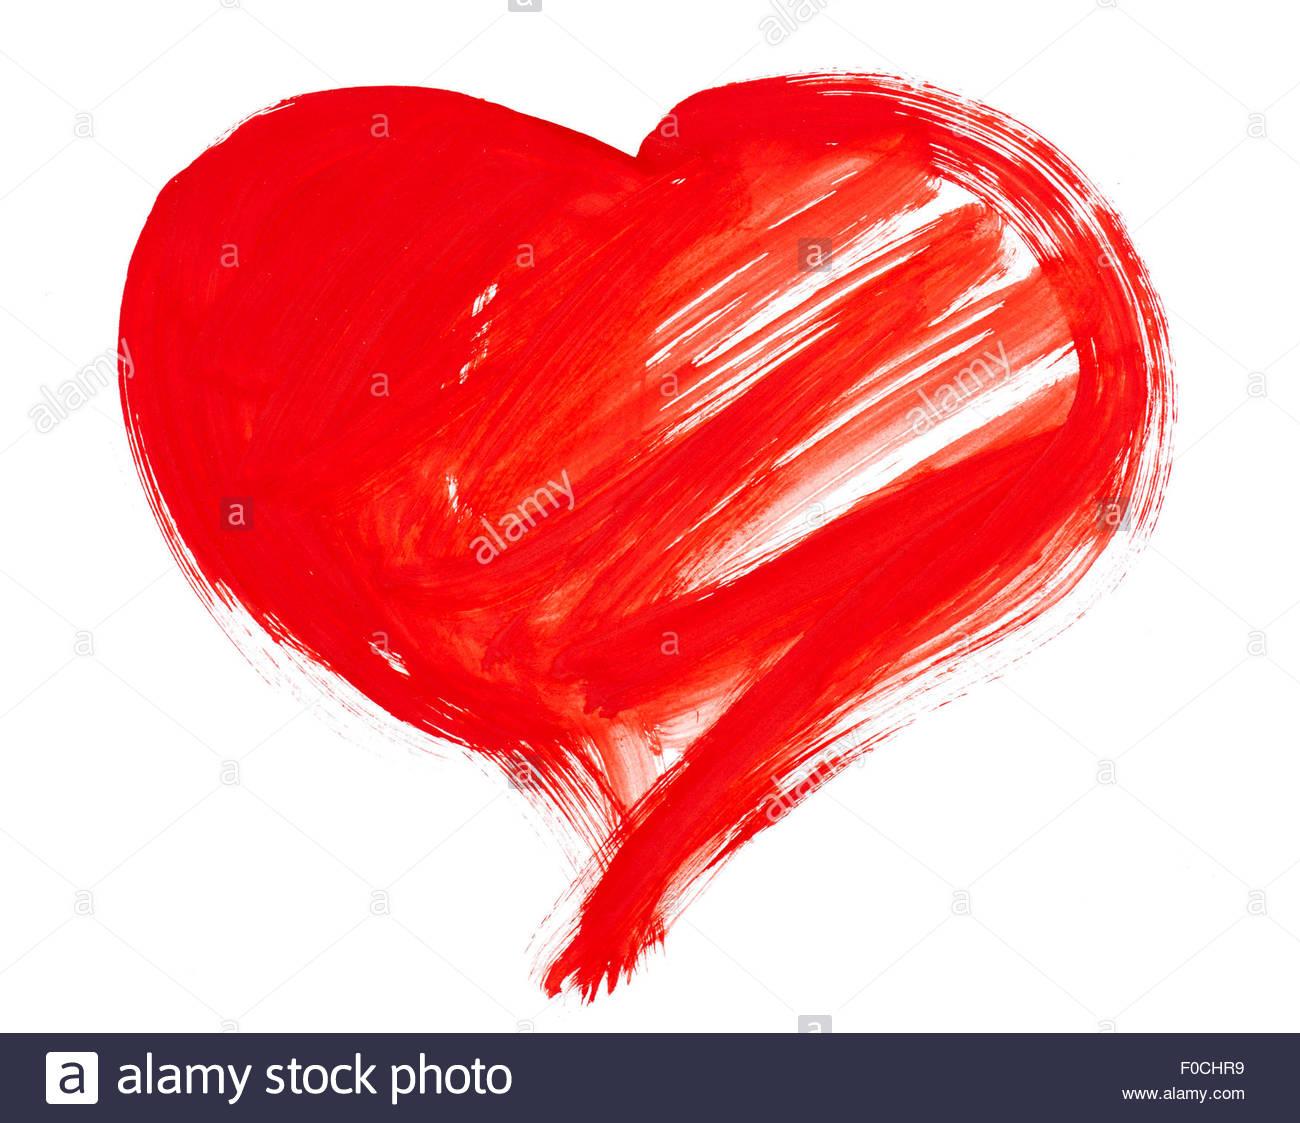 1300x1123 Red Big Heart Symbol. Watercolor Drawing Stock Photo 86329245